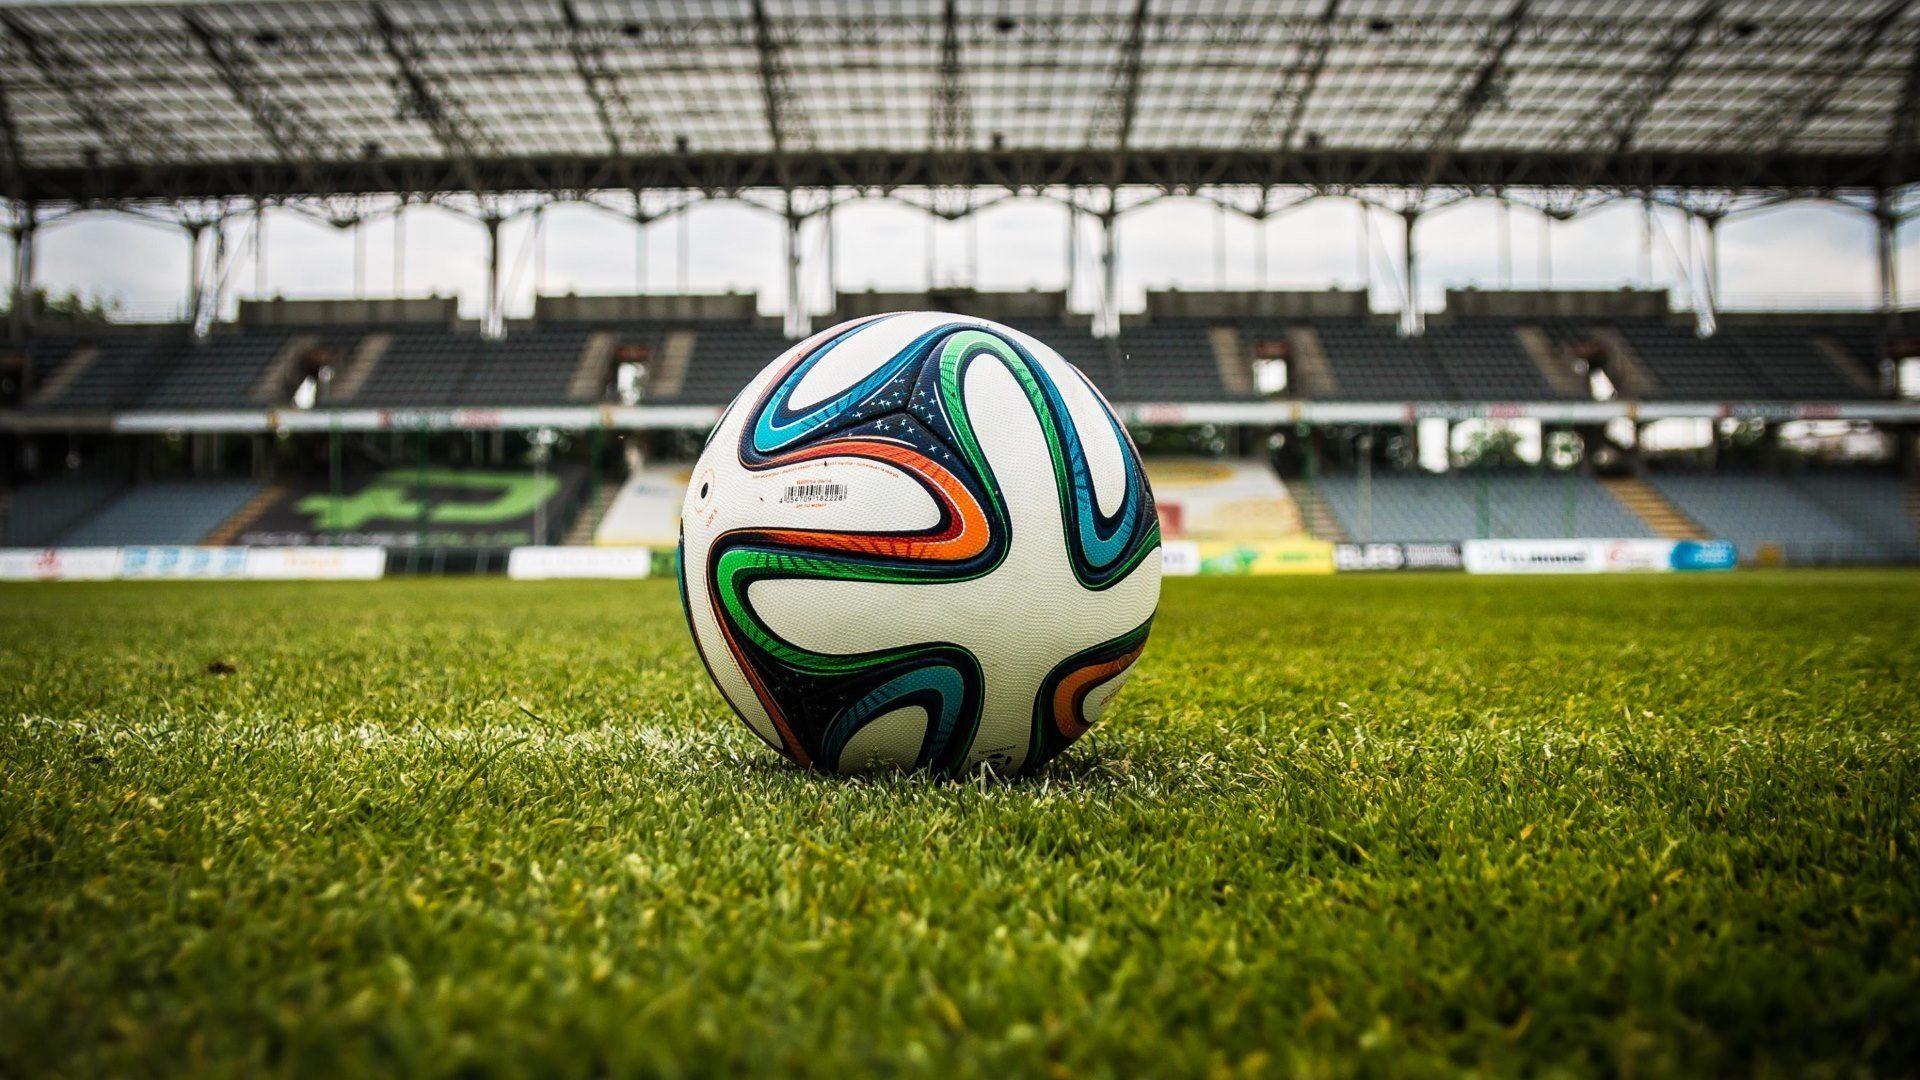 4K Soccer Wallpapers   Top 4K Soccer Backgrounds 1920x1080